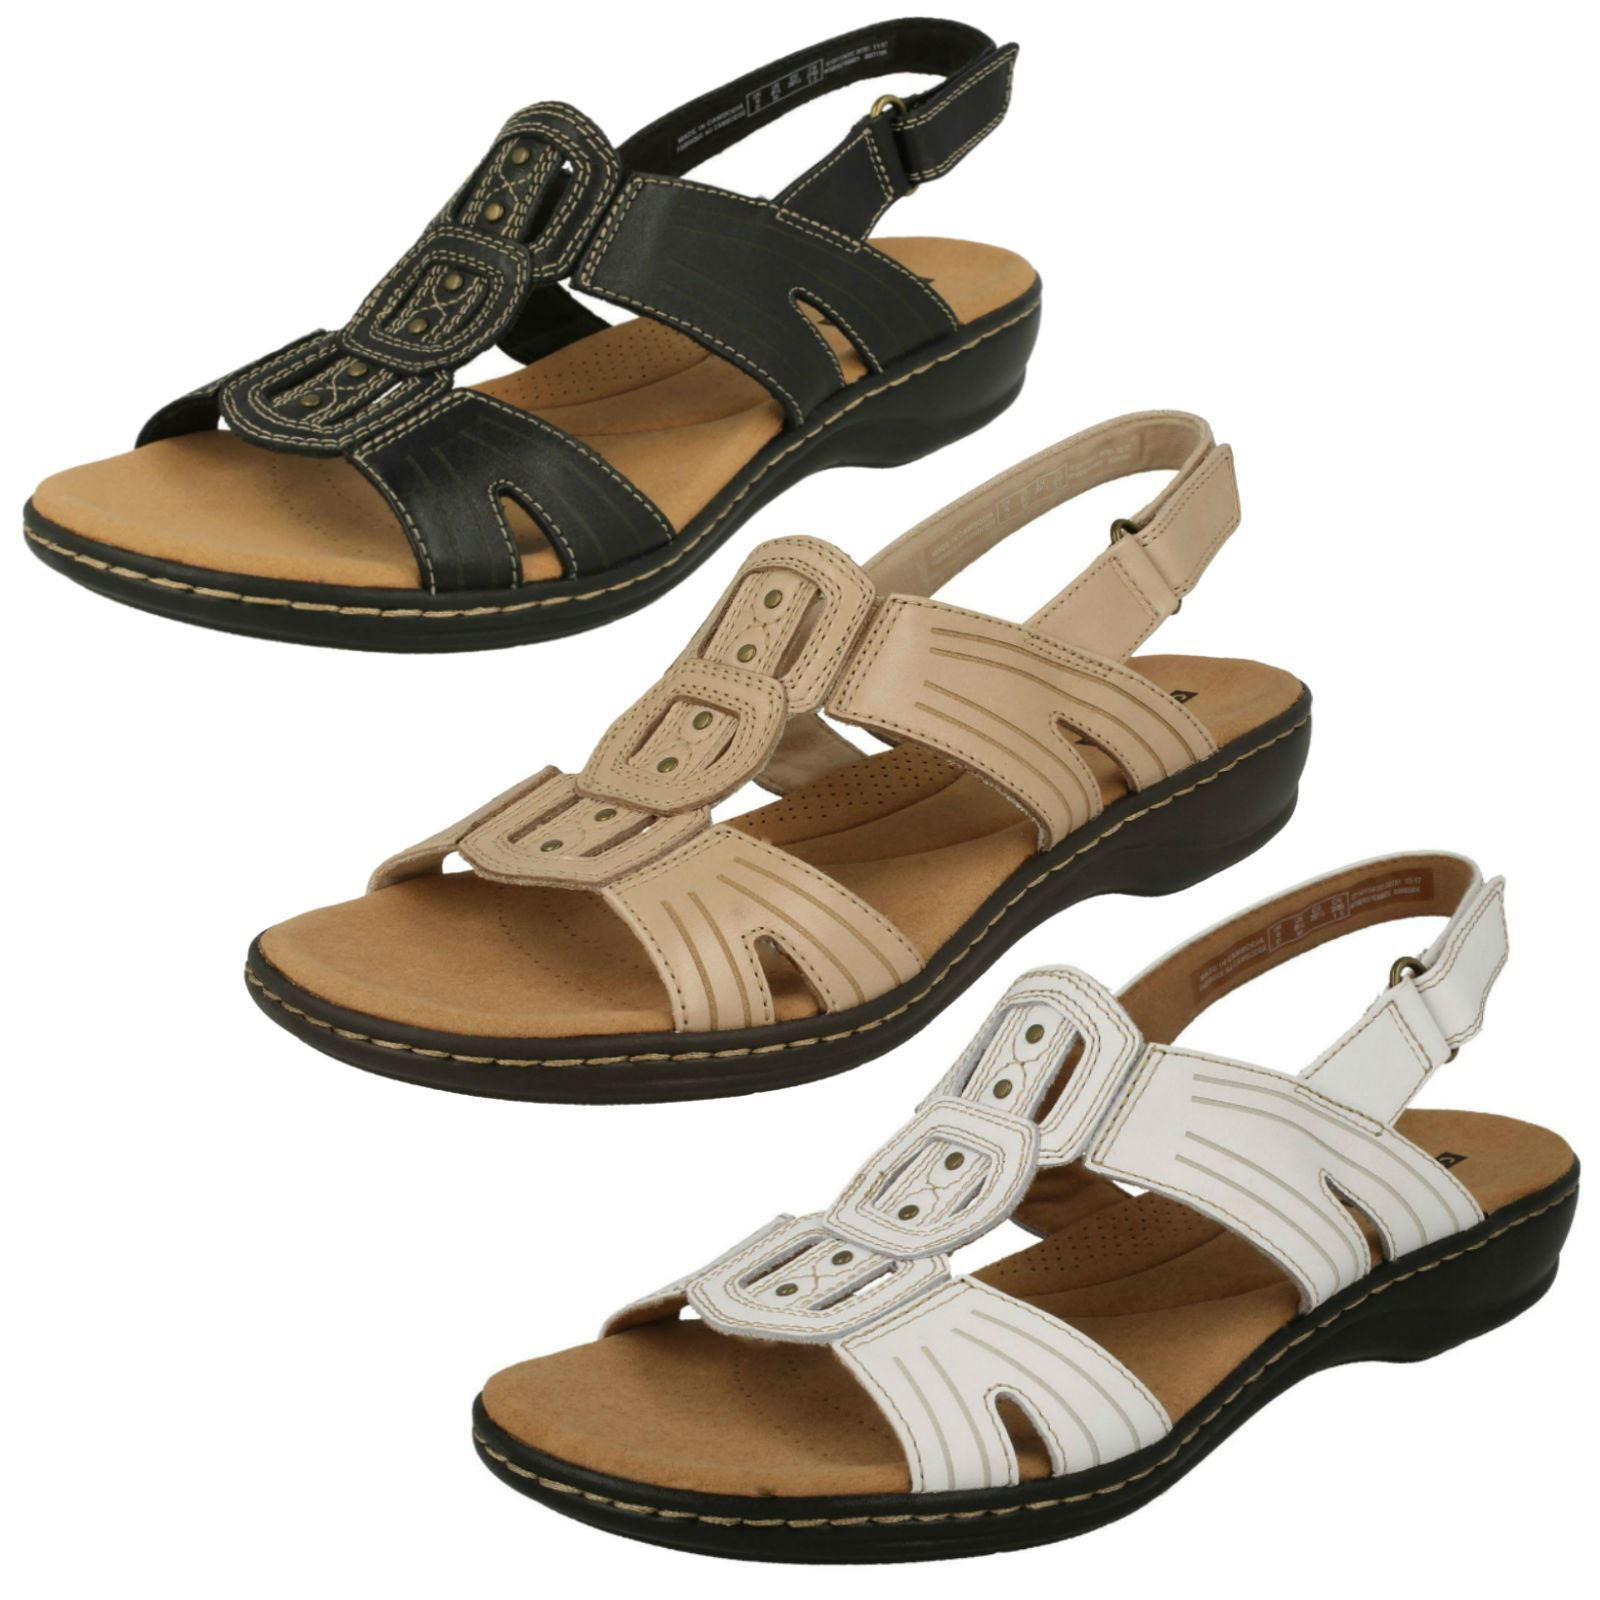 Sandali Donna Donna Sandali Clarks Sandali Cinturino-Leisa Vine 002990